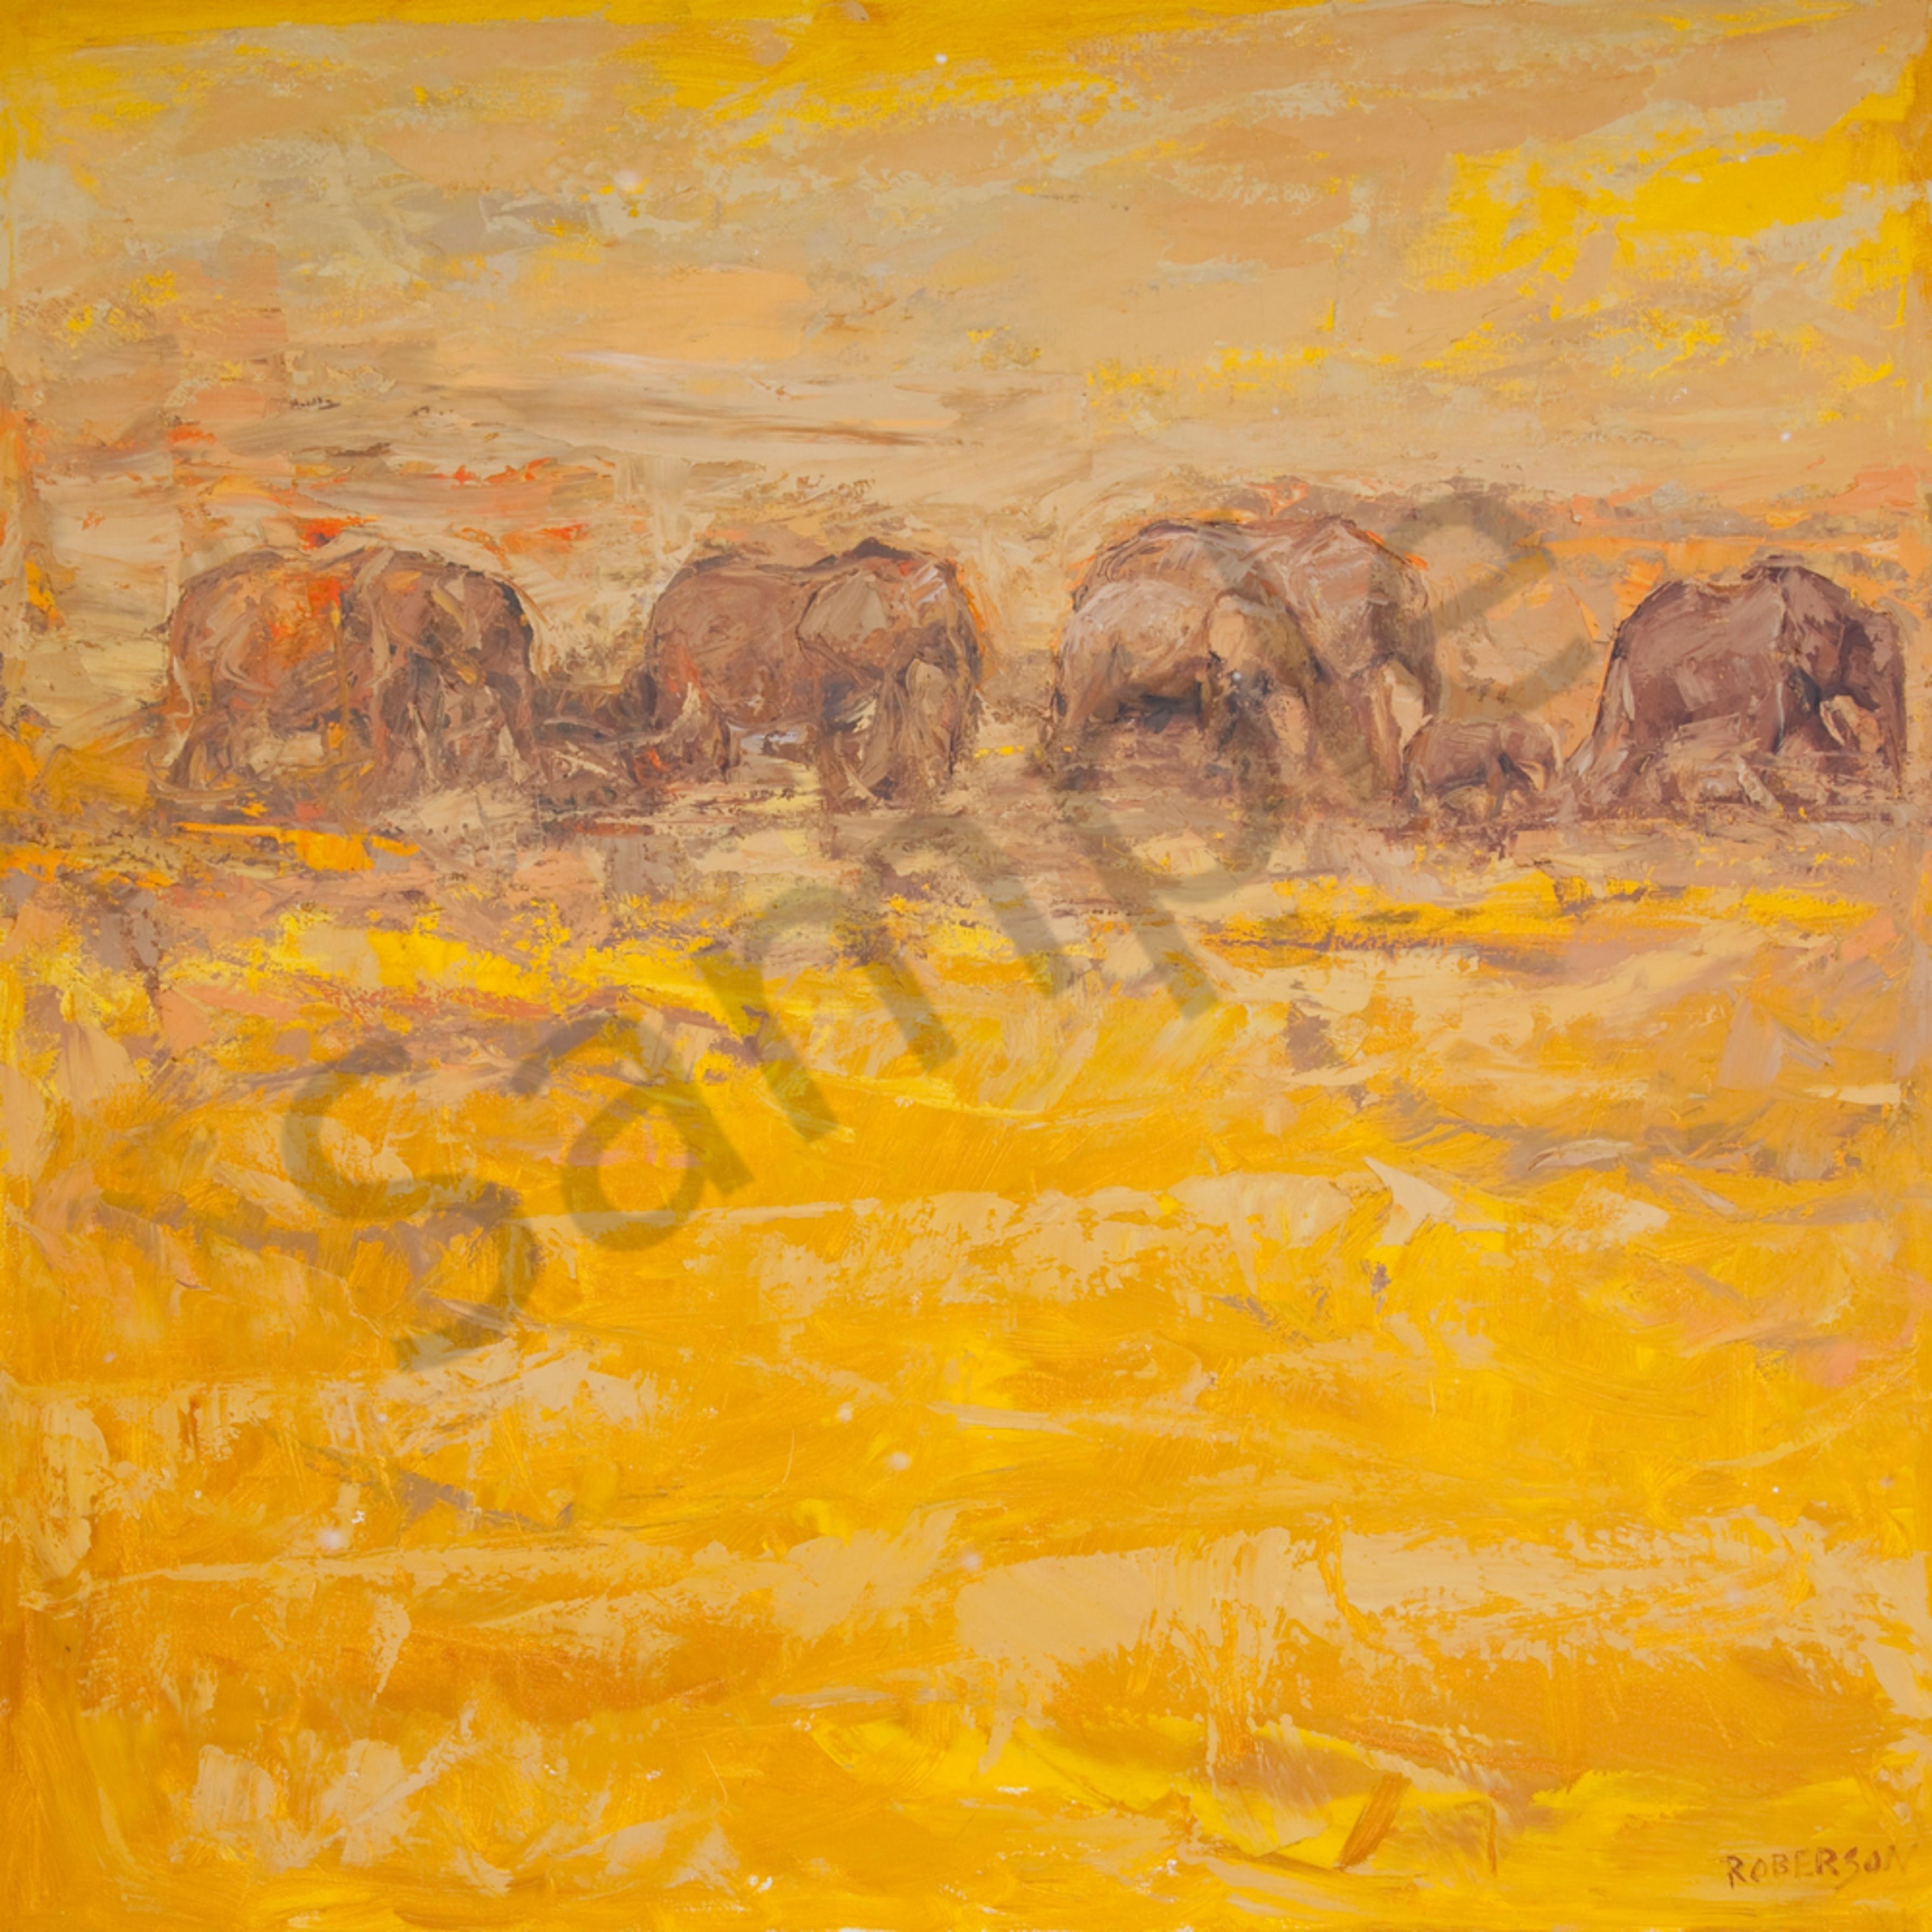 Amboseli evening kf3iuf